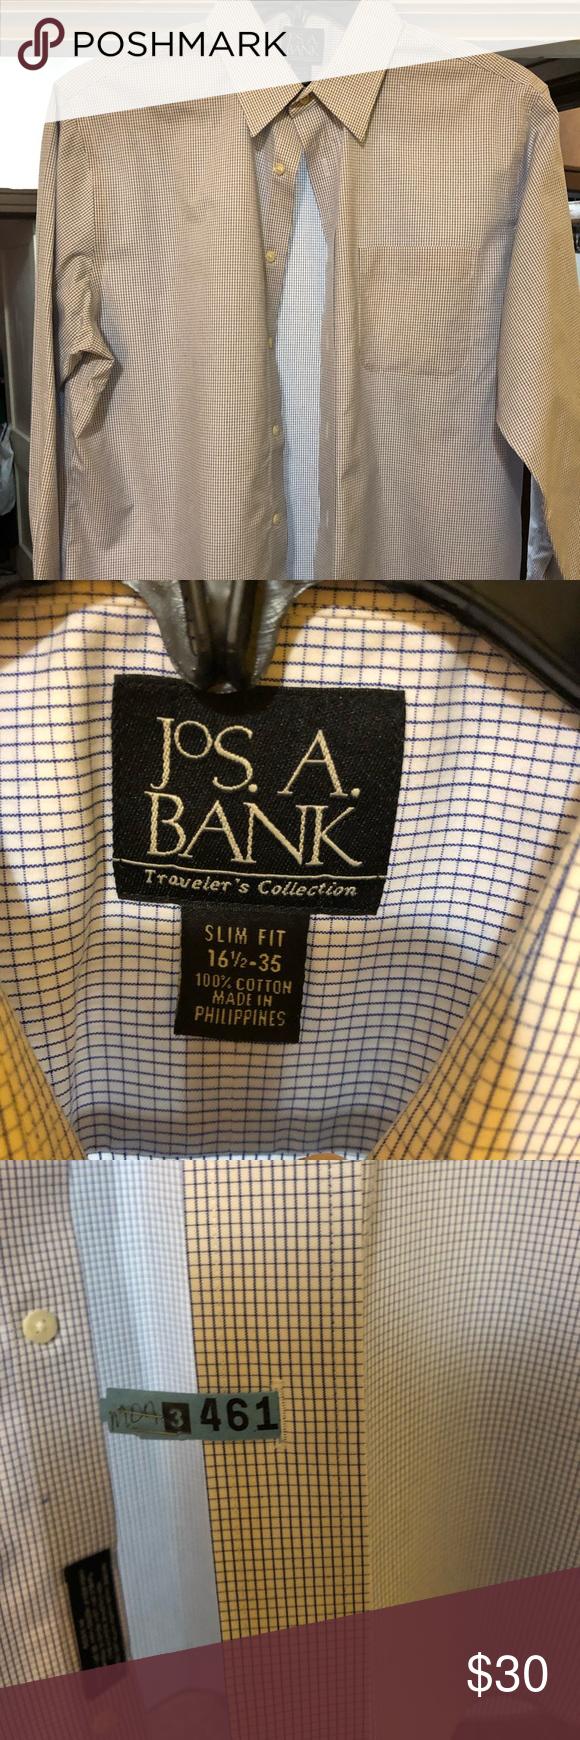 Jos A. Bank Dress Shirt Jos A. Bank light blue and white